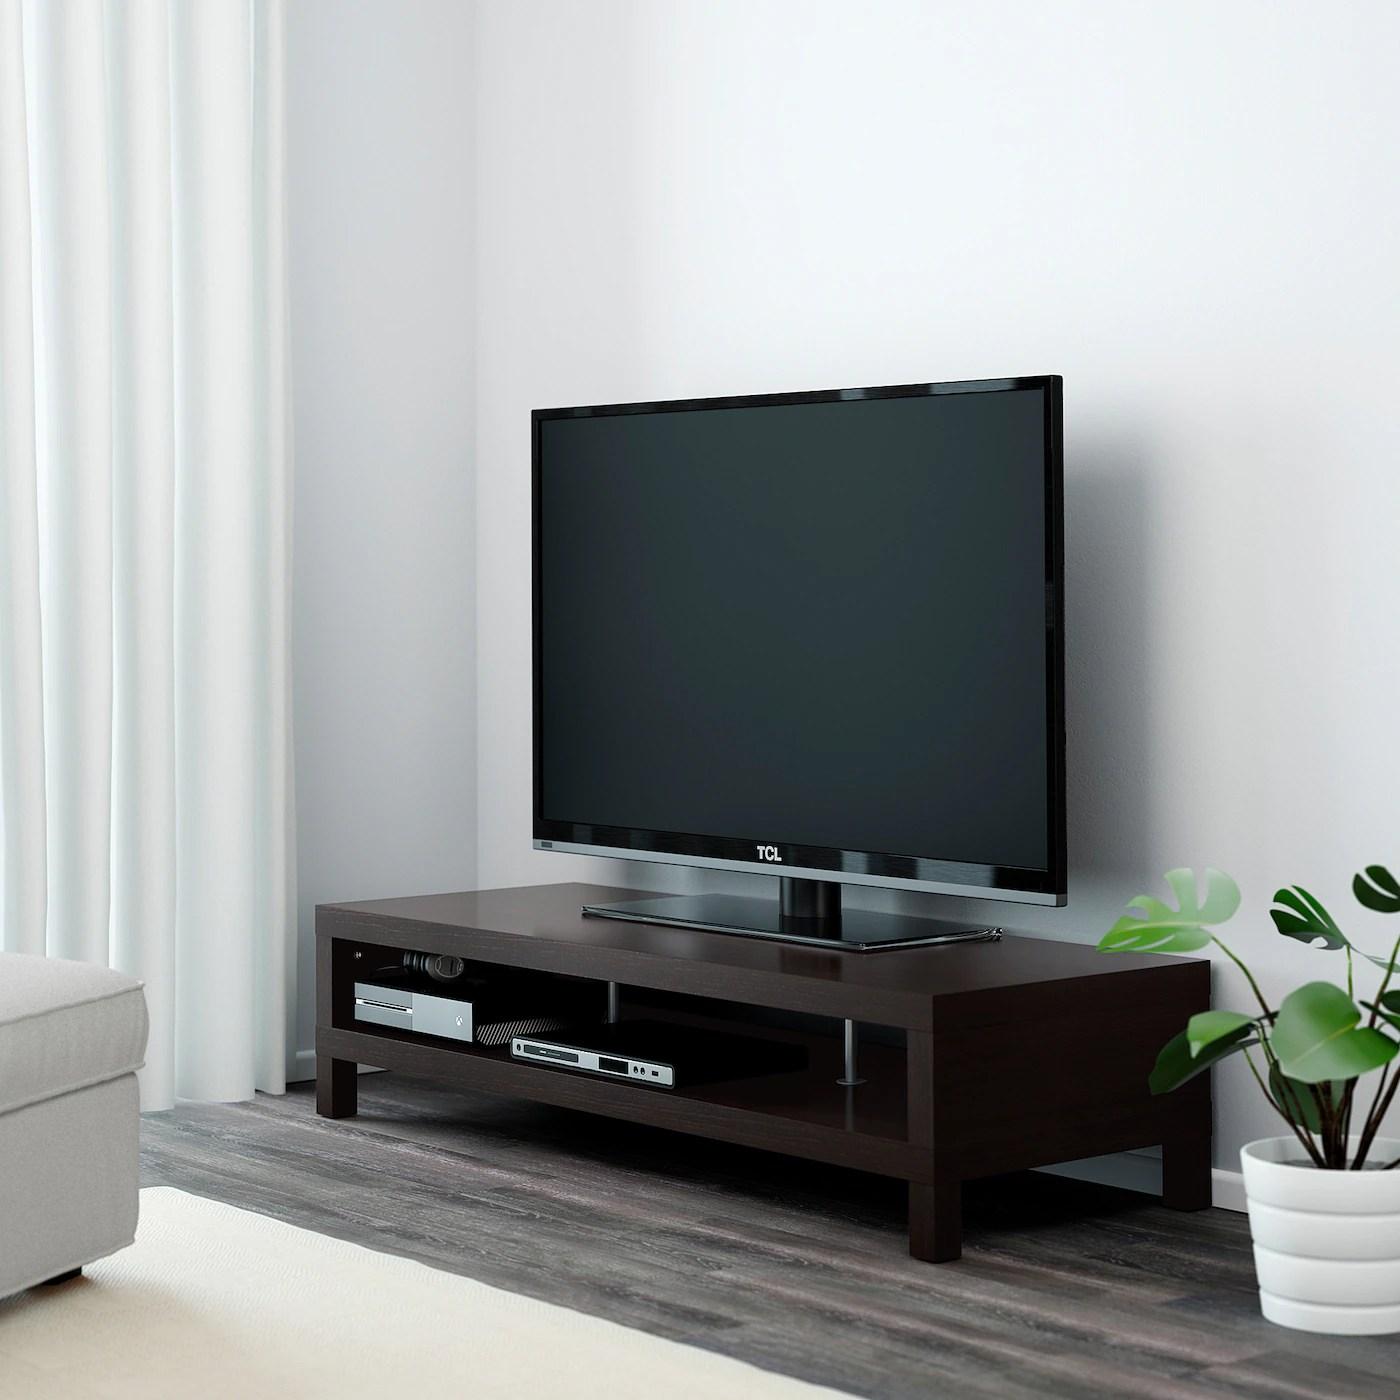 bakire ergenlik avlanmak meuble tv angle ikea